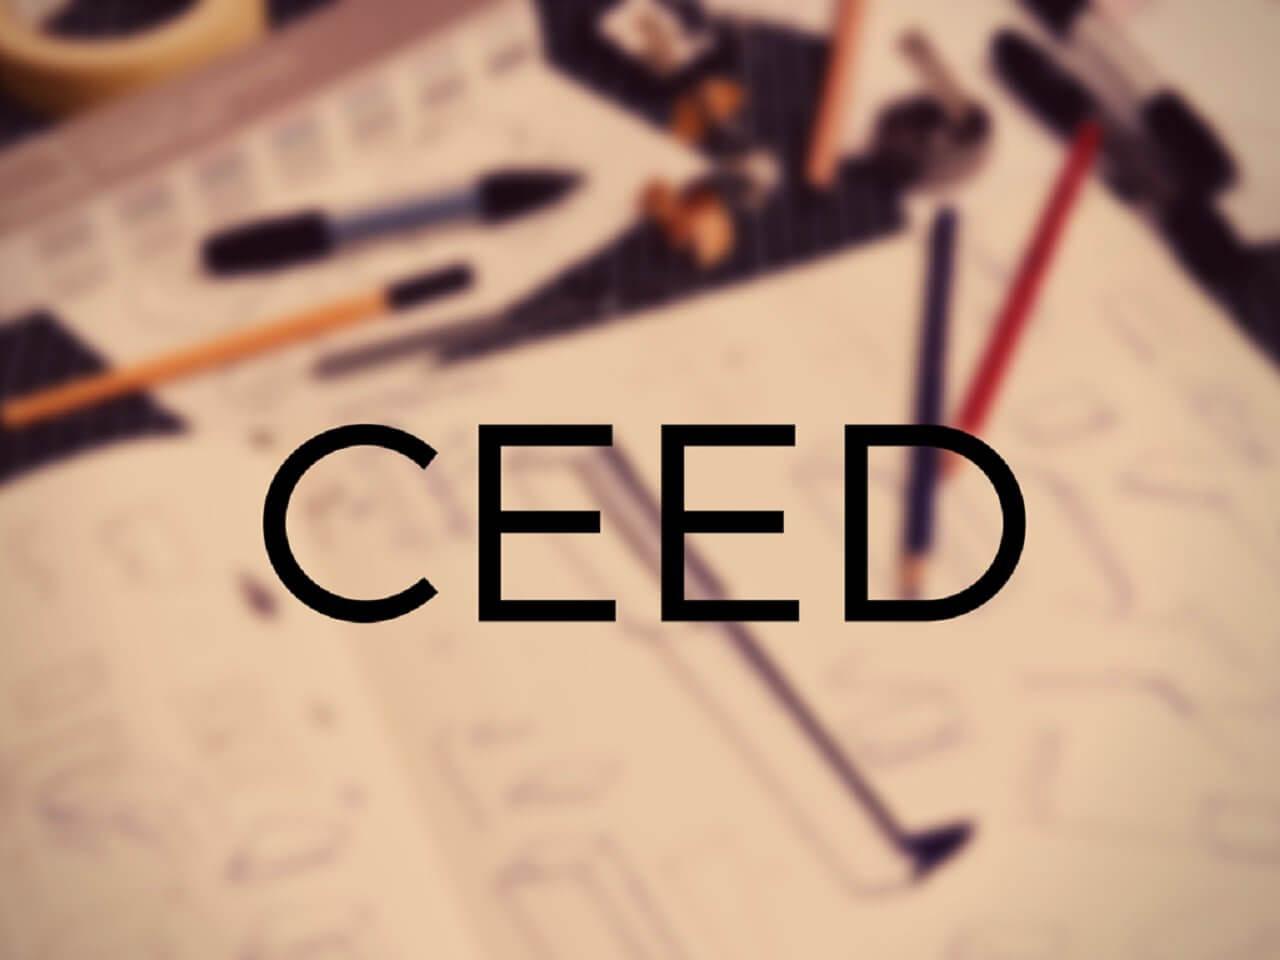 ceed - 3 - CEED